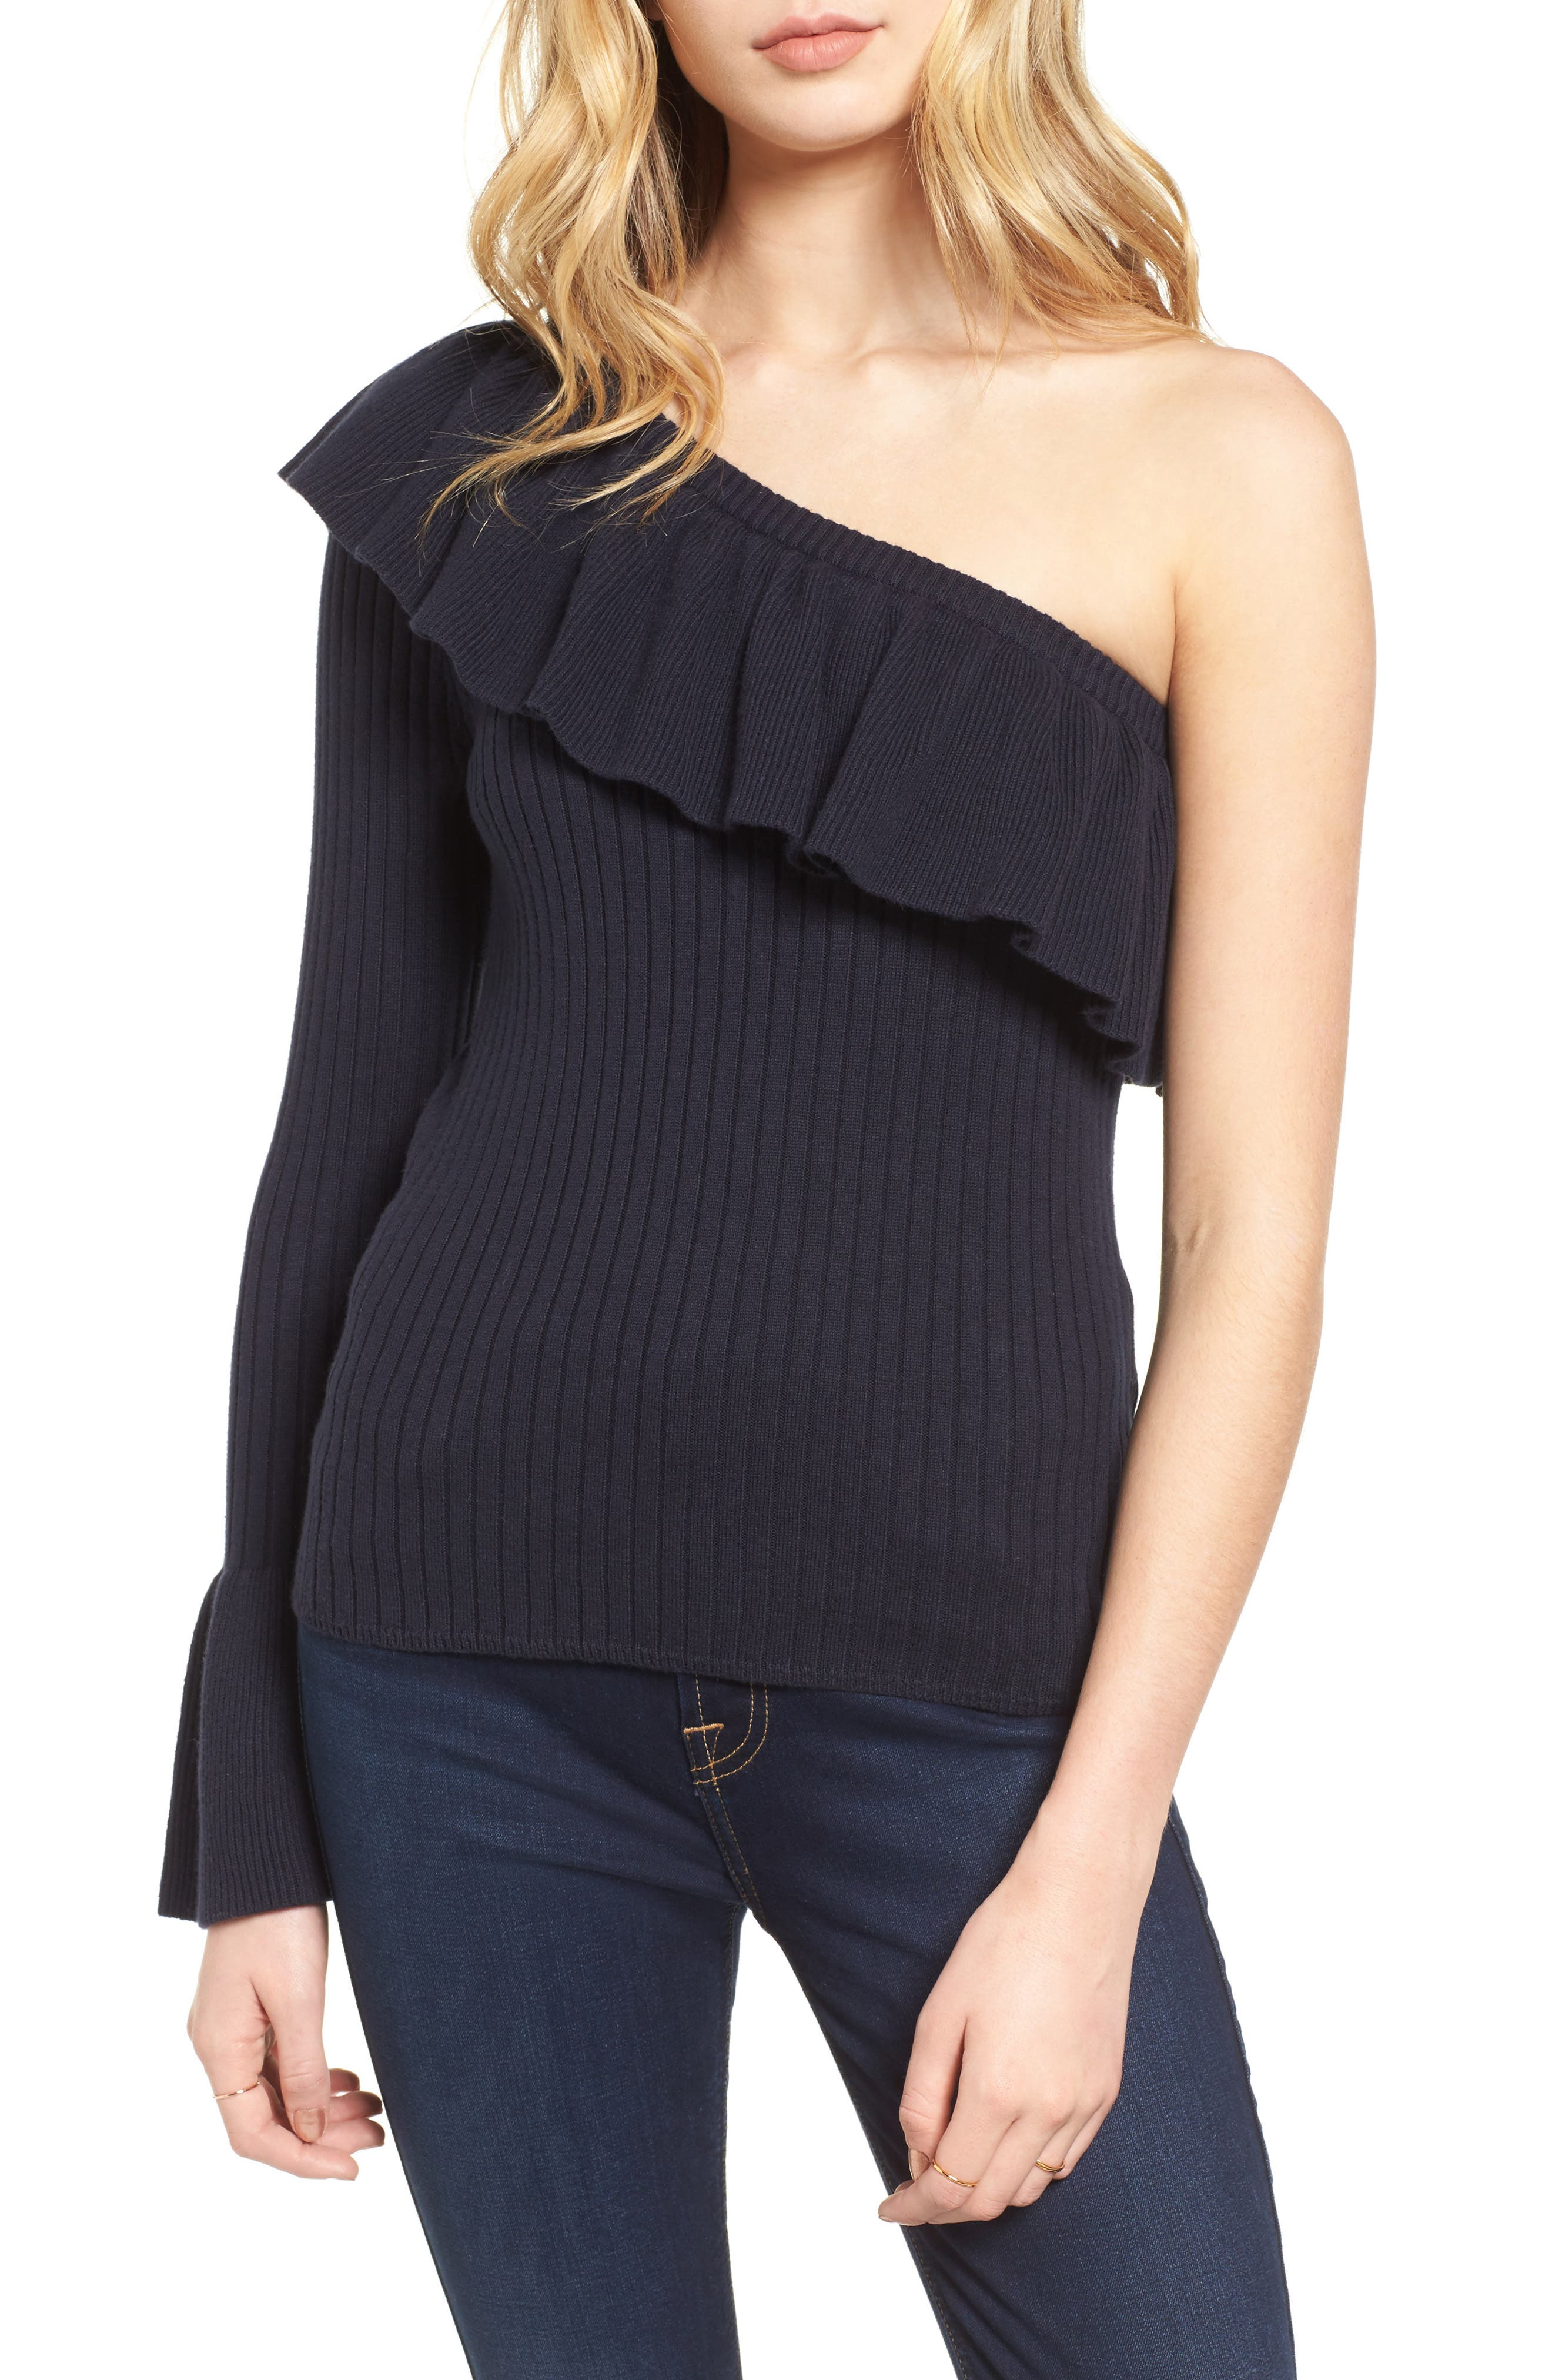 Ava One Shoulder Cotton & Cashmere Sweater,                             Main thumbnail 1, color,                             Navy